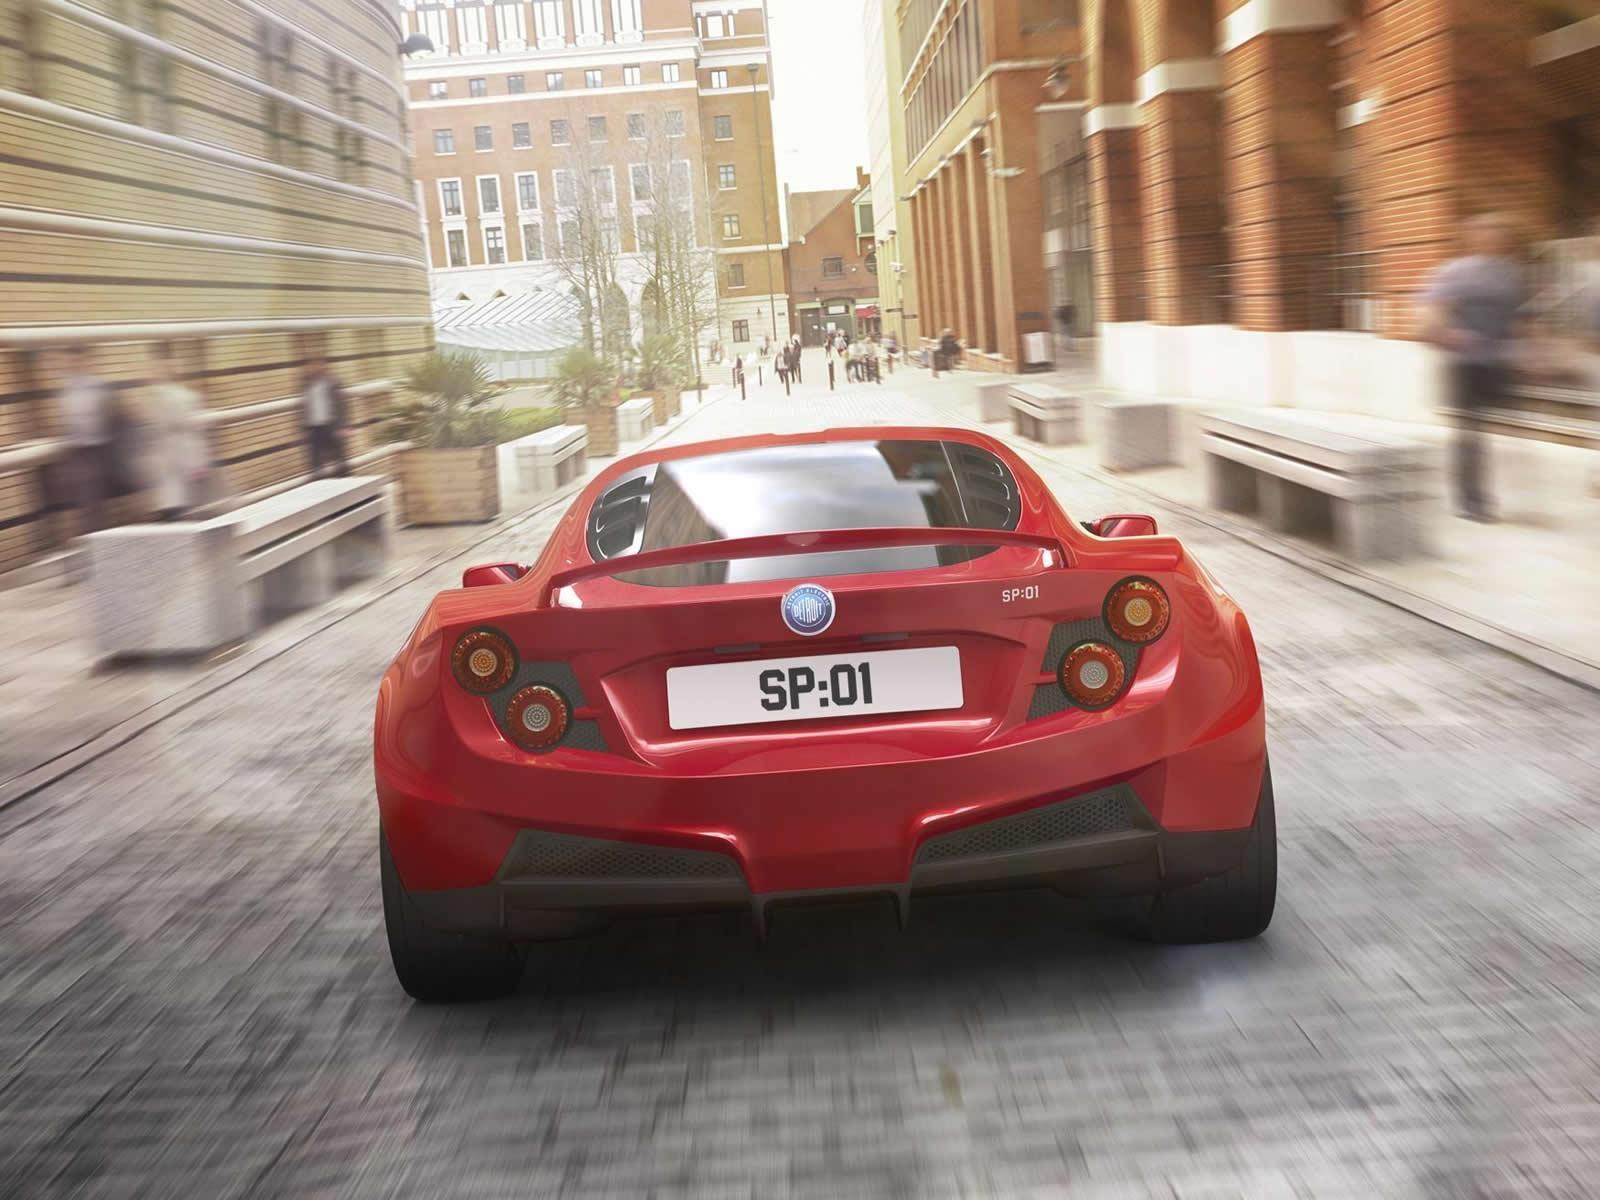 Автодайджест №277: гибридная «Гранта» и BMW X5 M